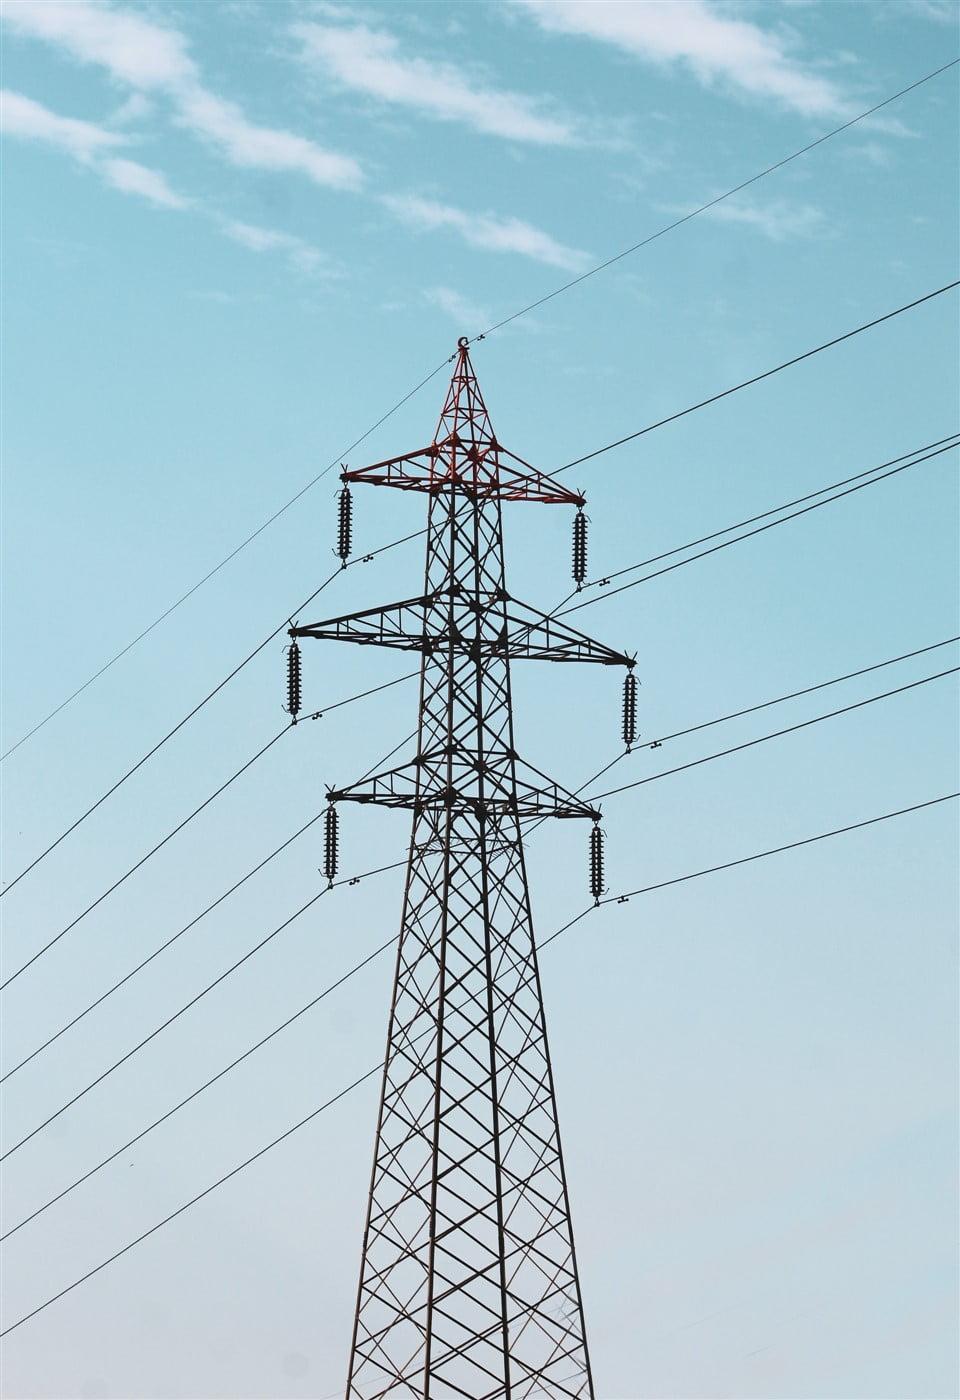 Power grid against the blue sky